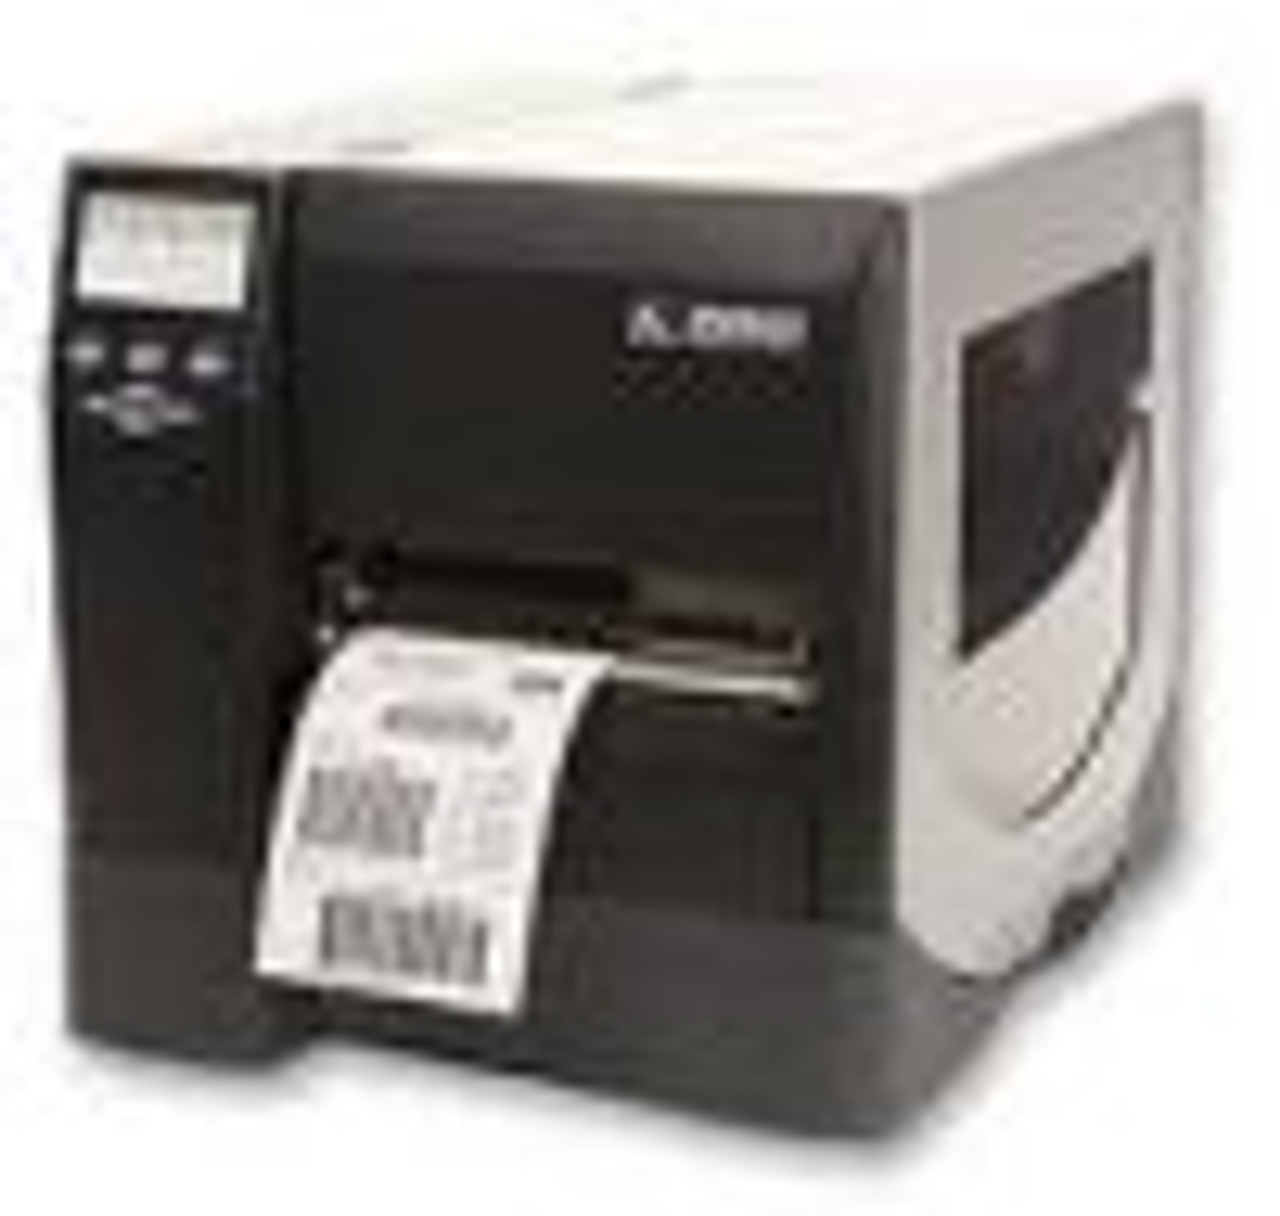 ZM600 Printers